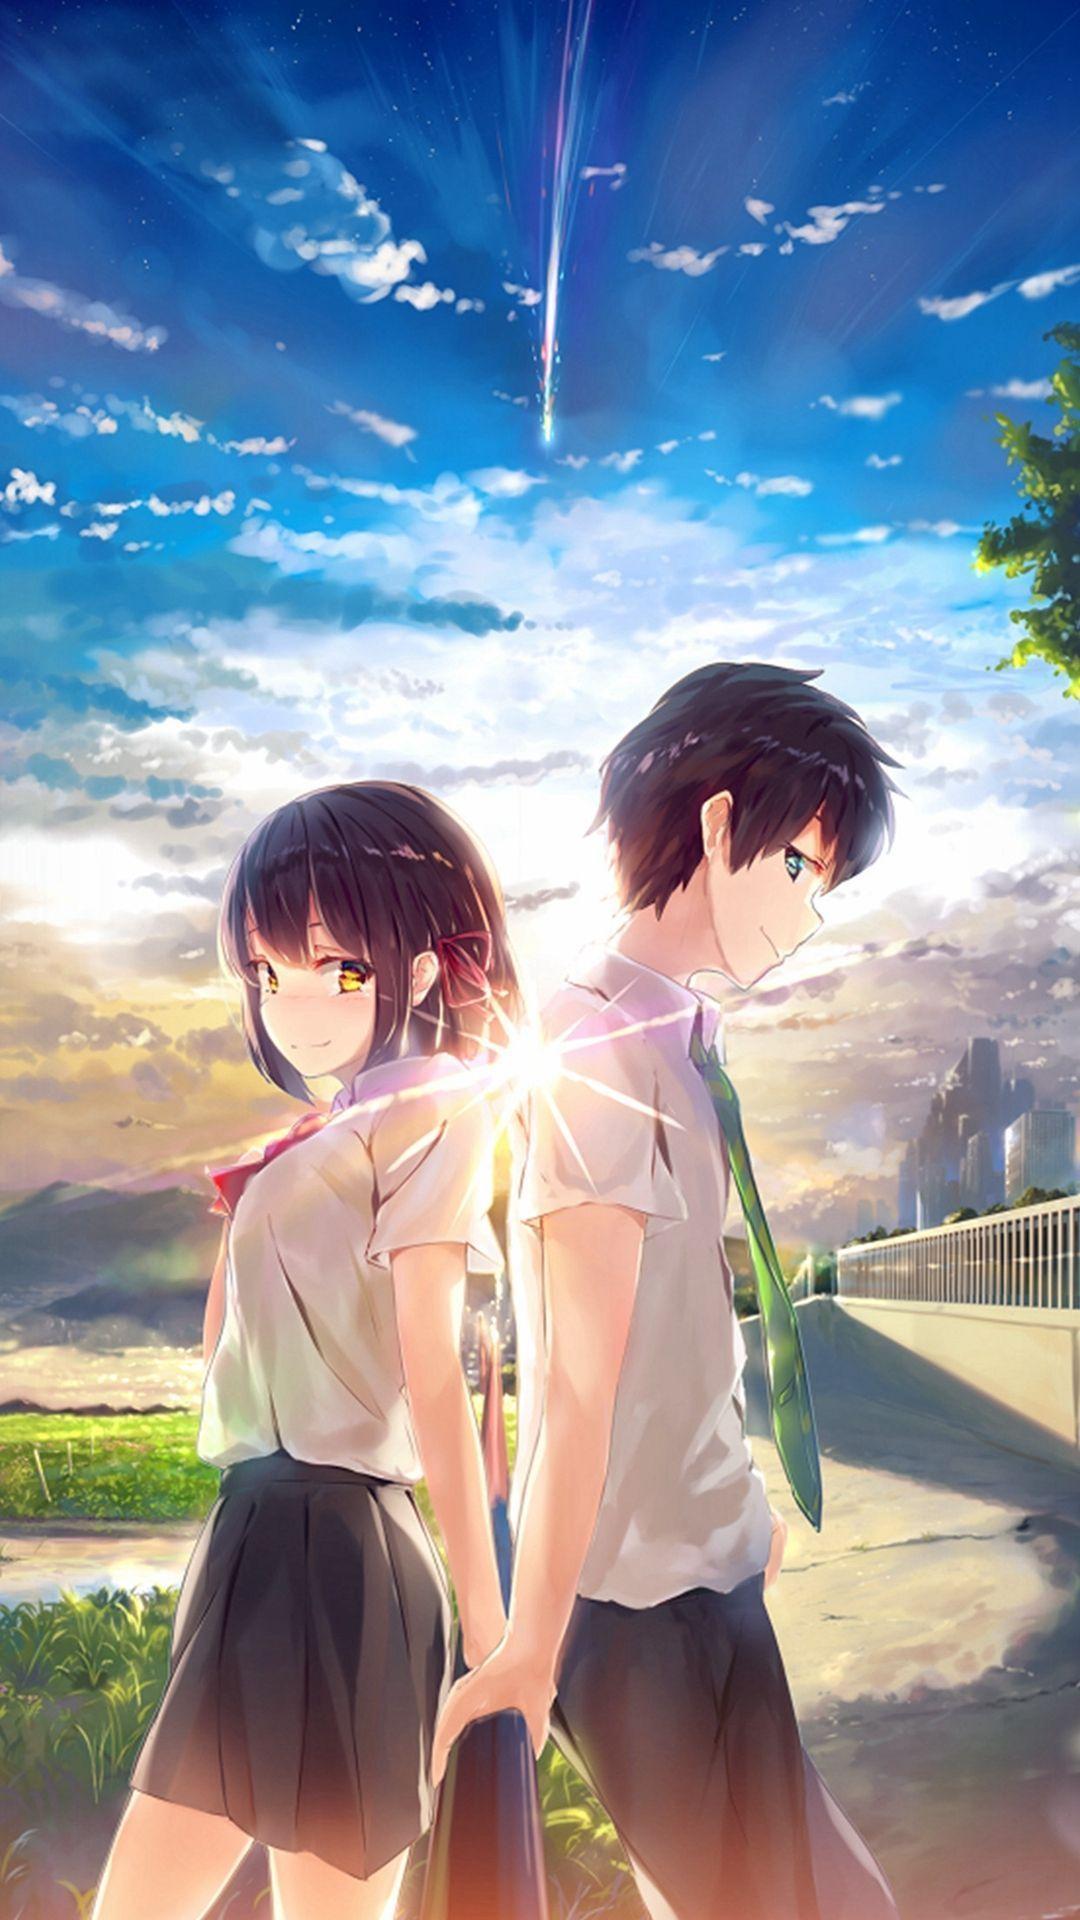 Anime Wallpaper Girl And Boy - Anime Wallpaper HD